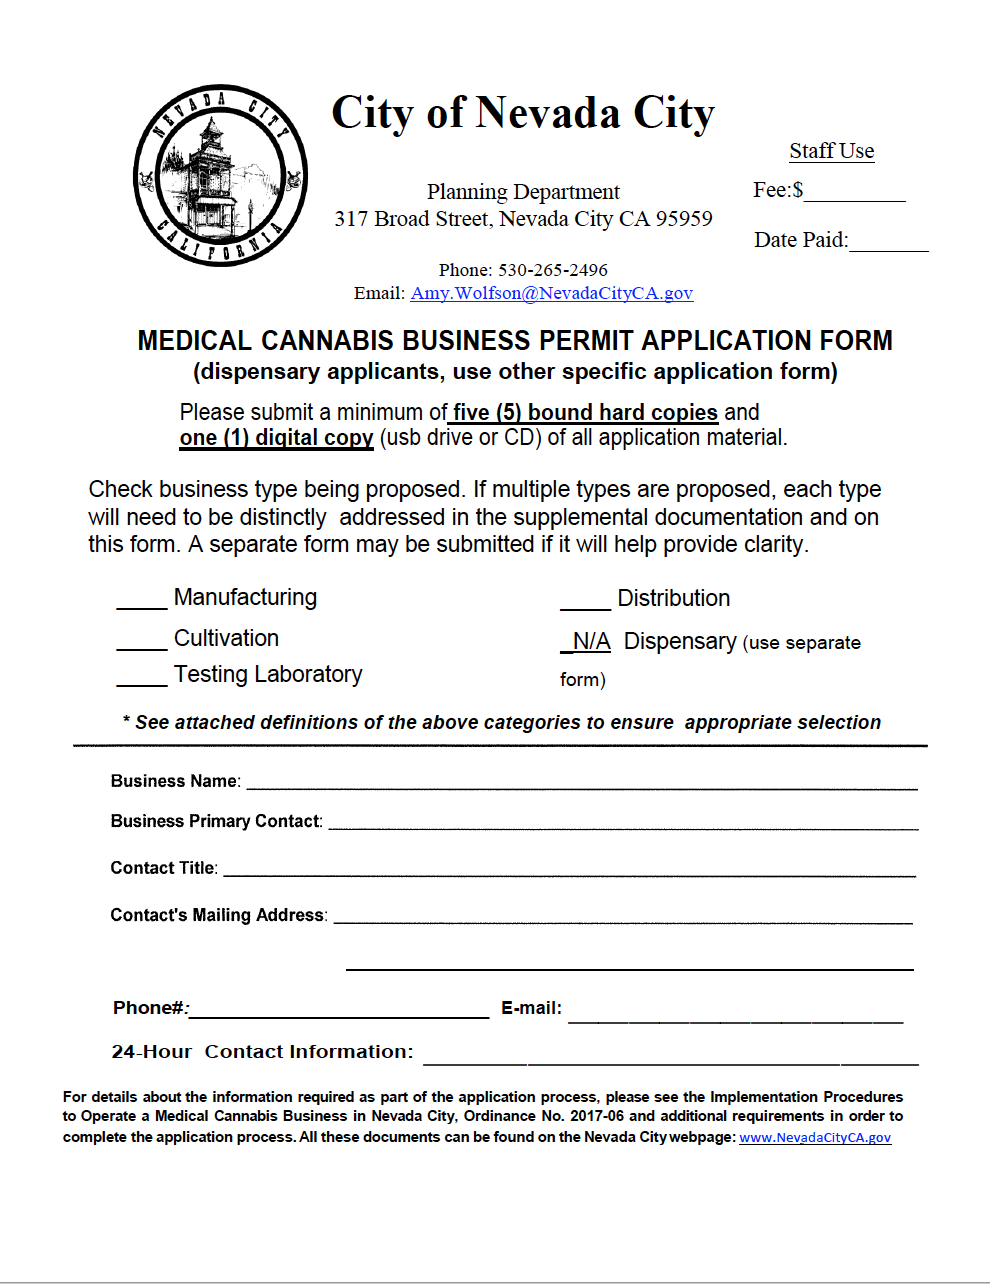 Other Biz Application.png